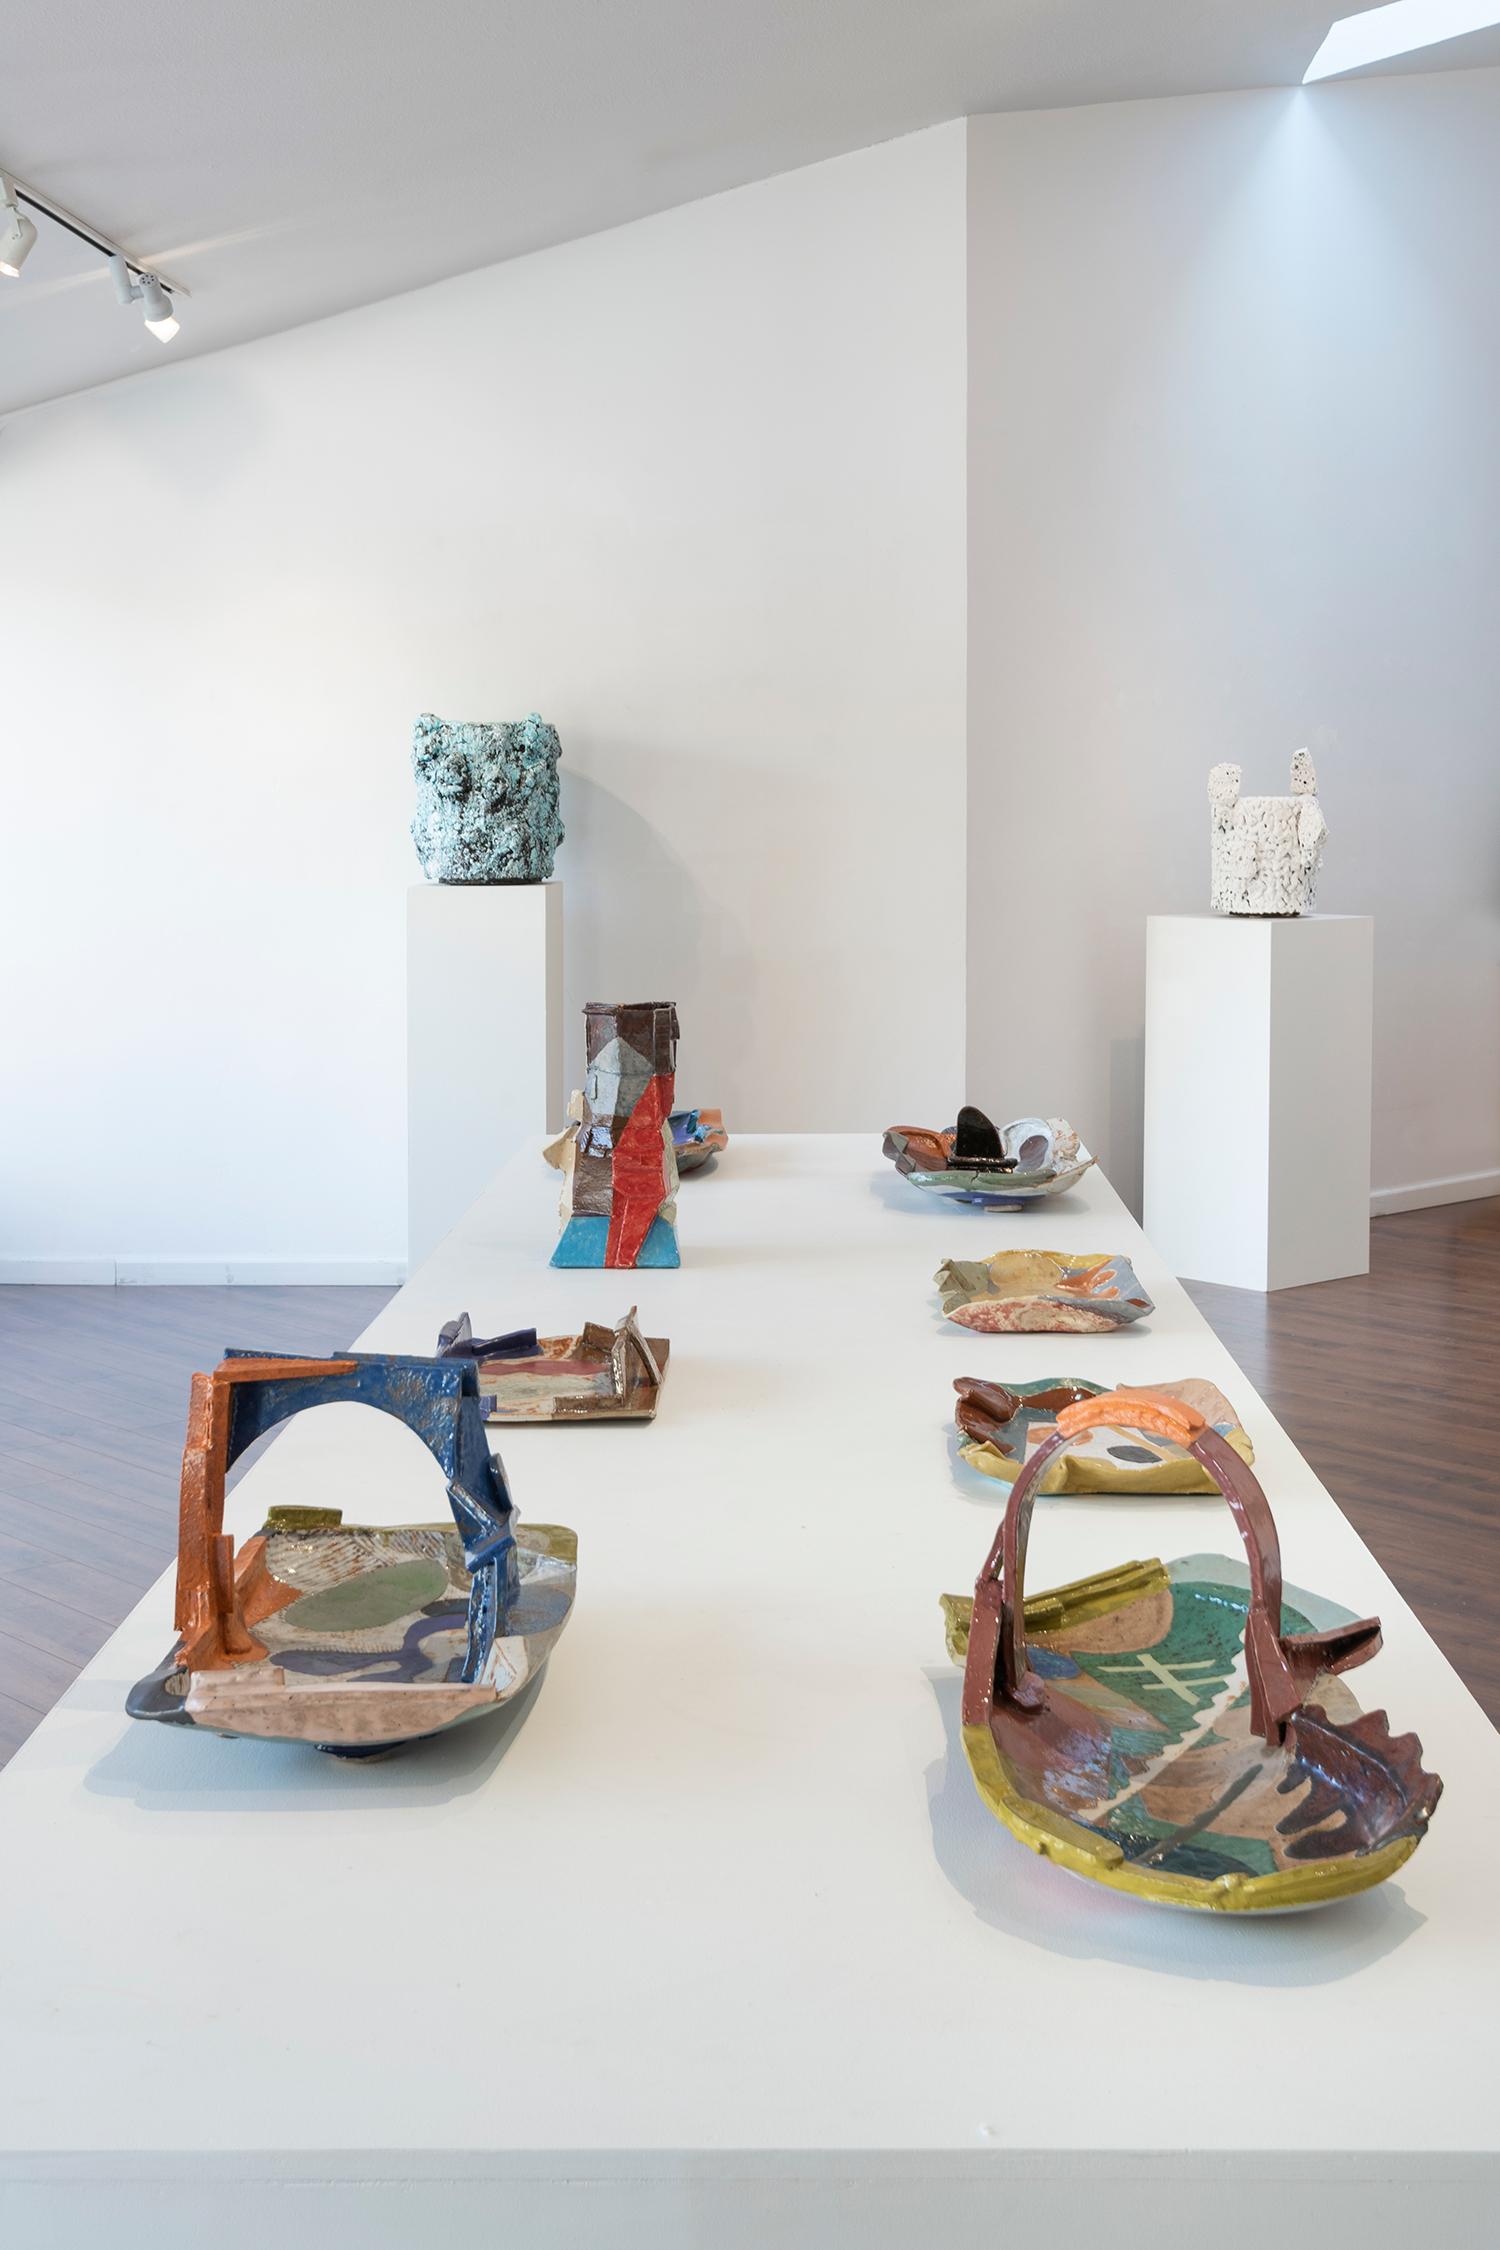 Installation view (John Gill, Tony Marsh)